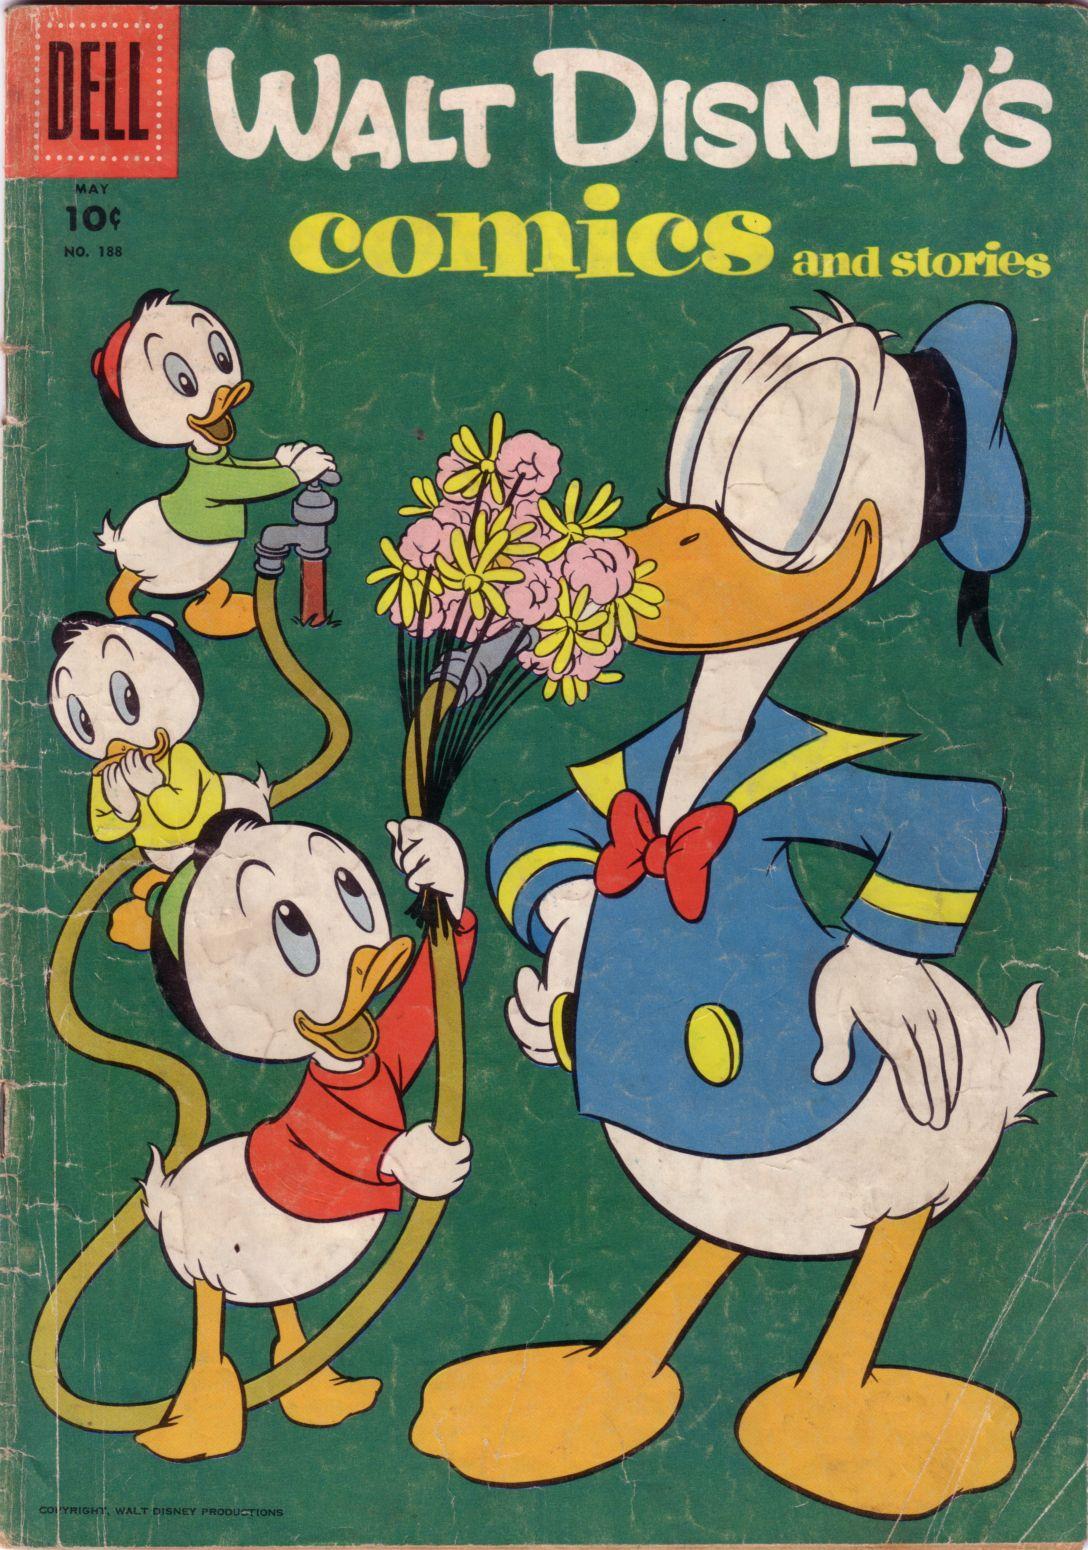 Walt Disneys Comics and Stories 188 Page 1